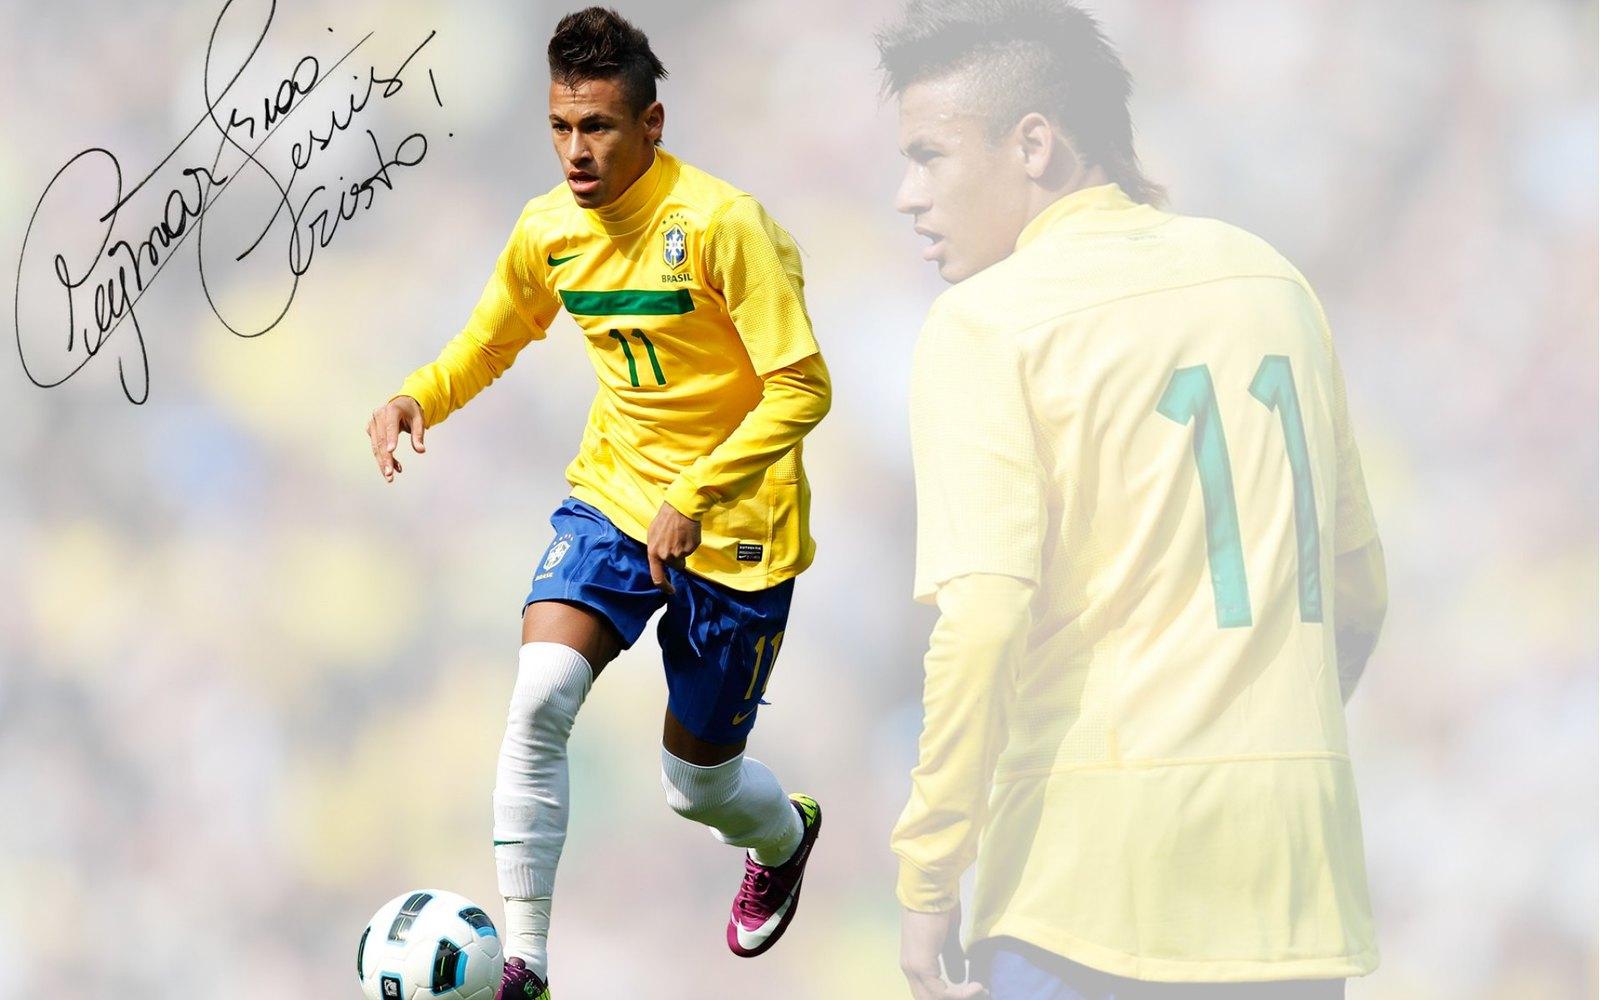 neymar cover full hd photo